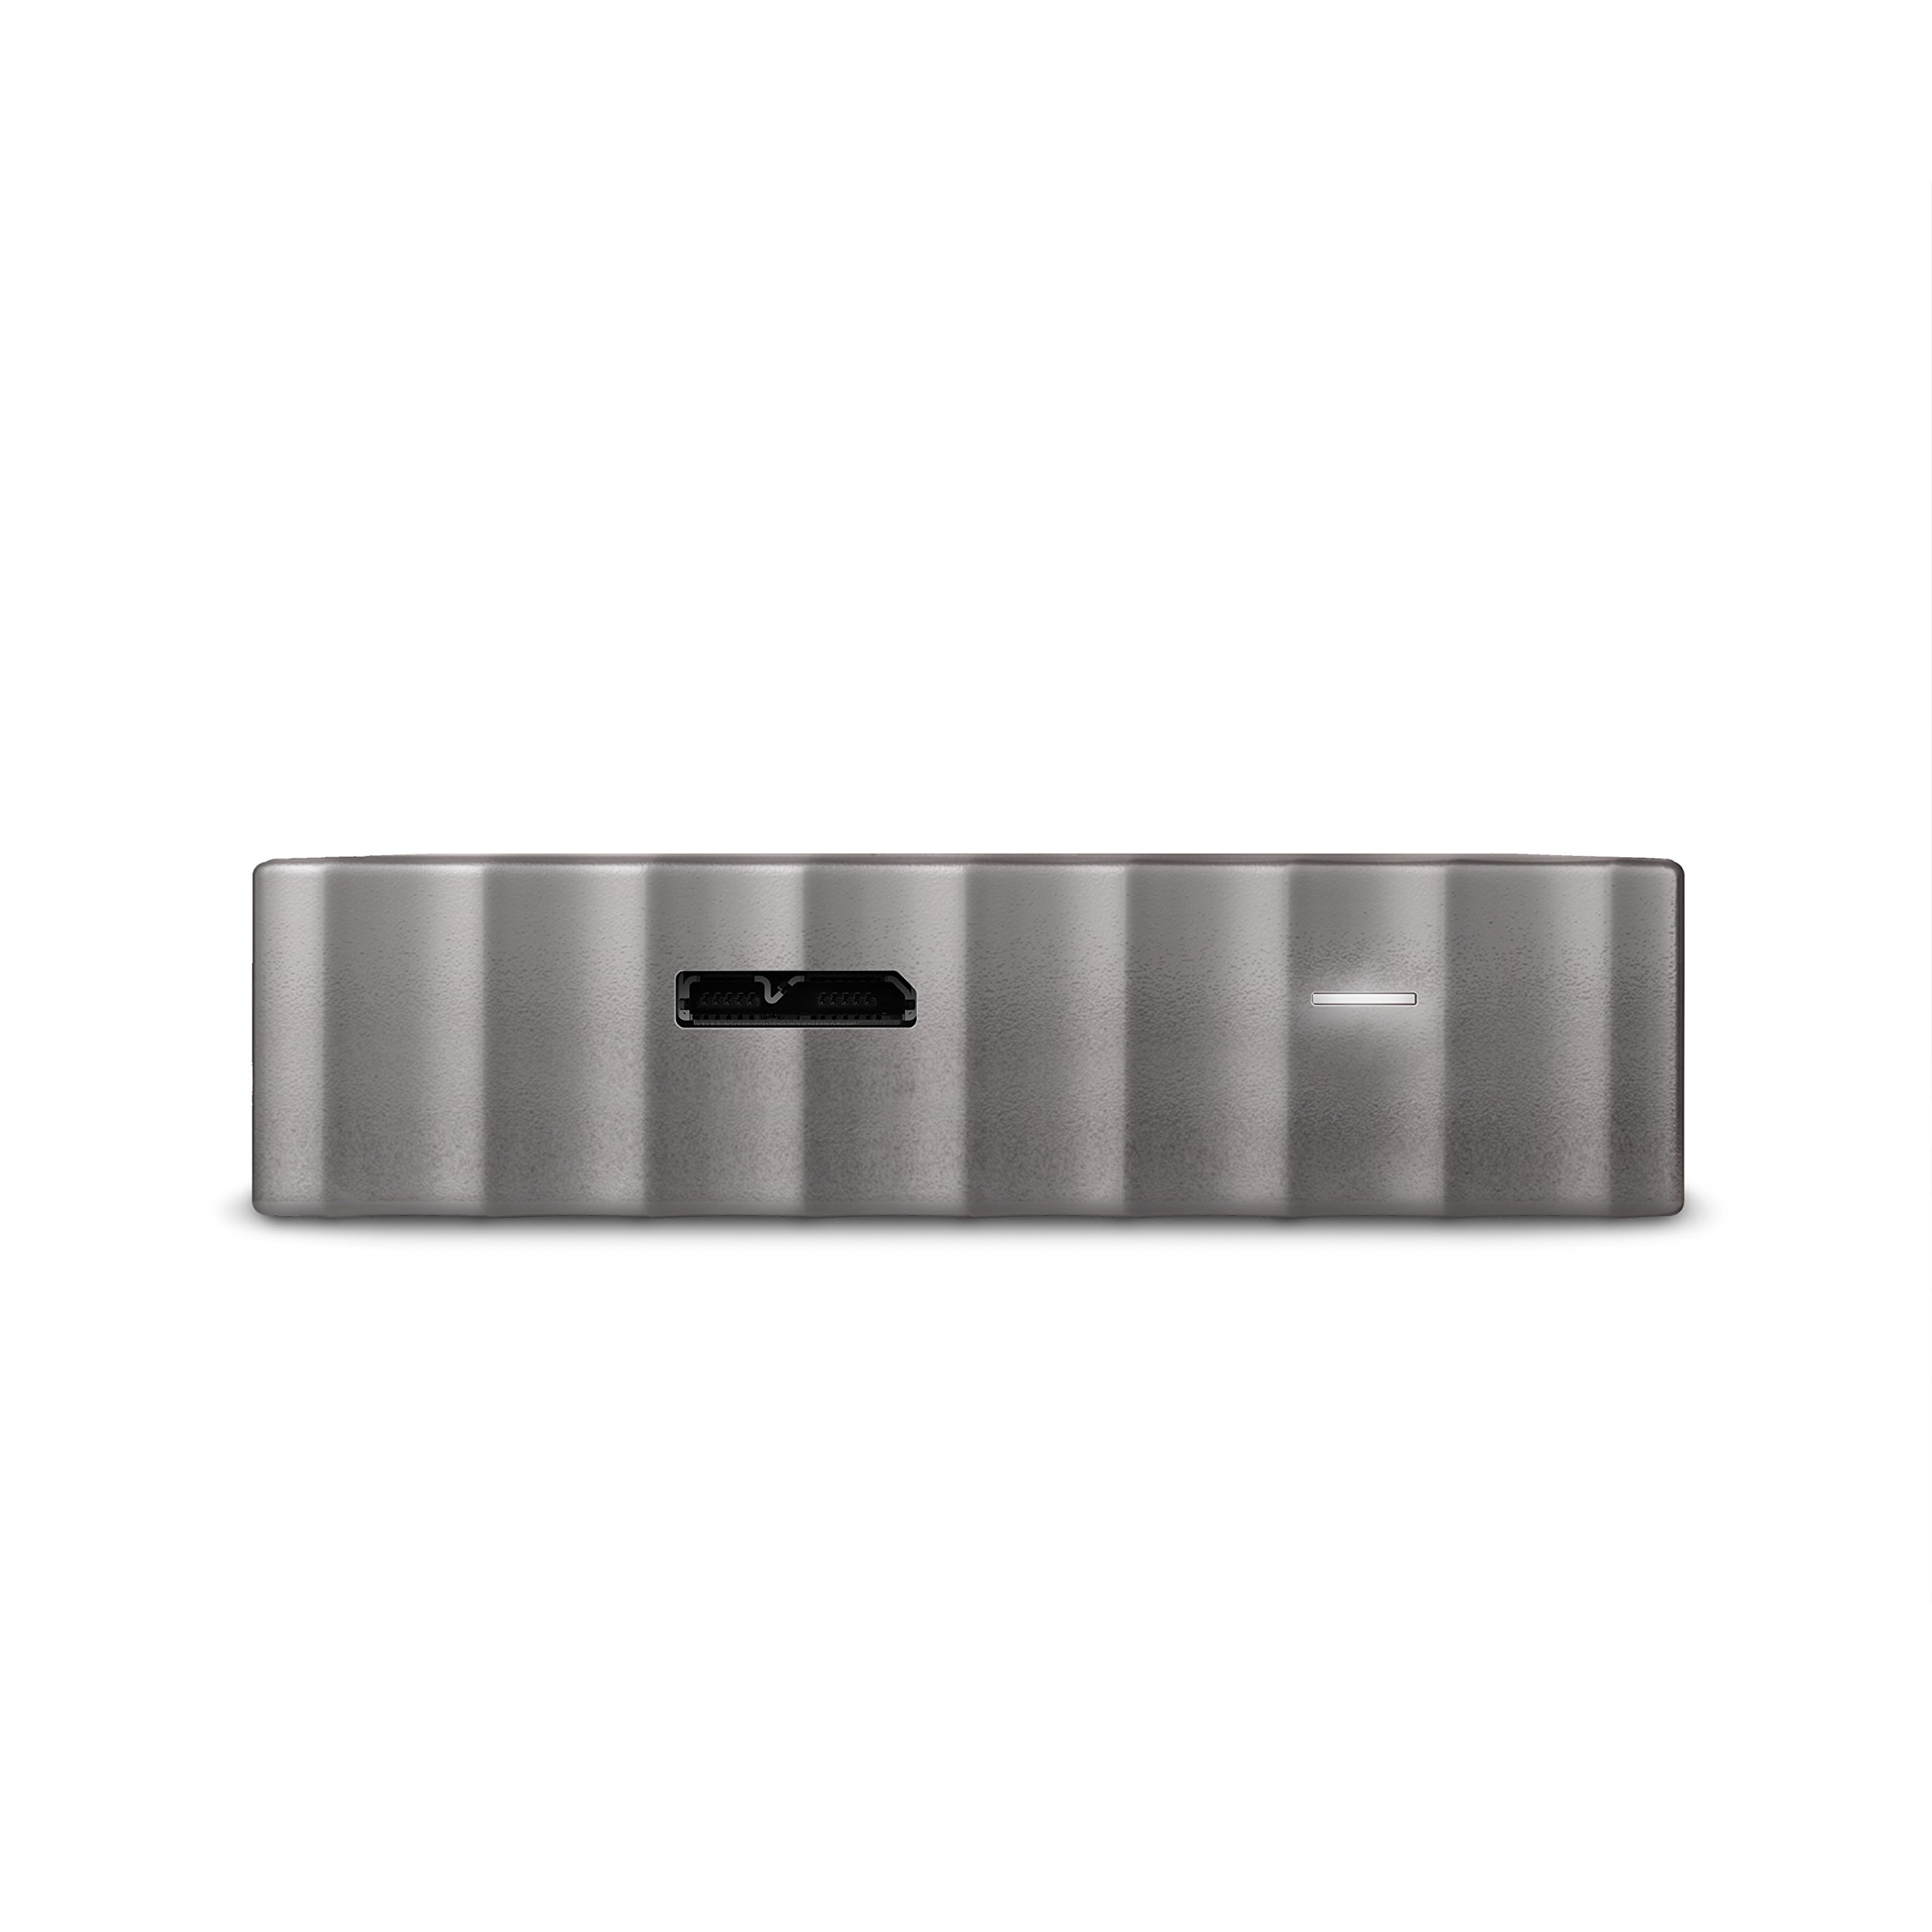 WD 1TB Black-Gray My Passport Ultra Portable External Hard Drive - USB 3.0 - WDBTLG0010BGY-WESN (Old Generation) by Western Digital (Image #4)